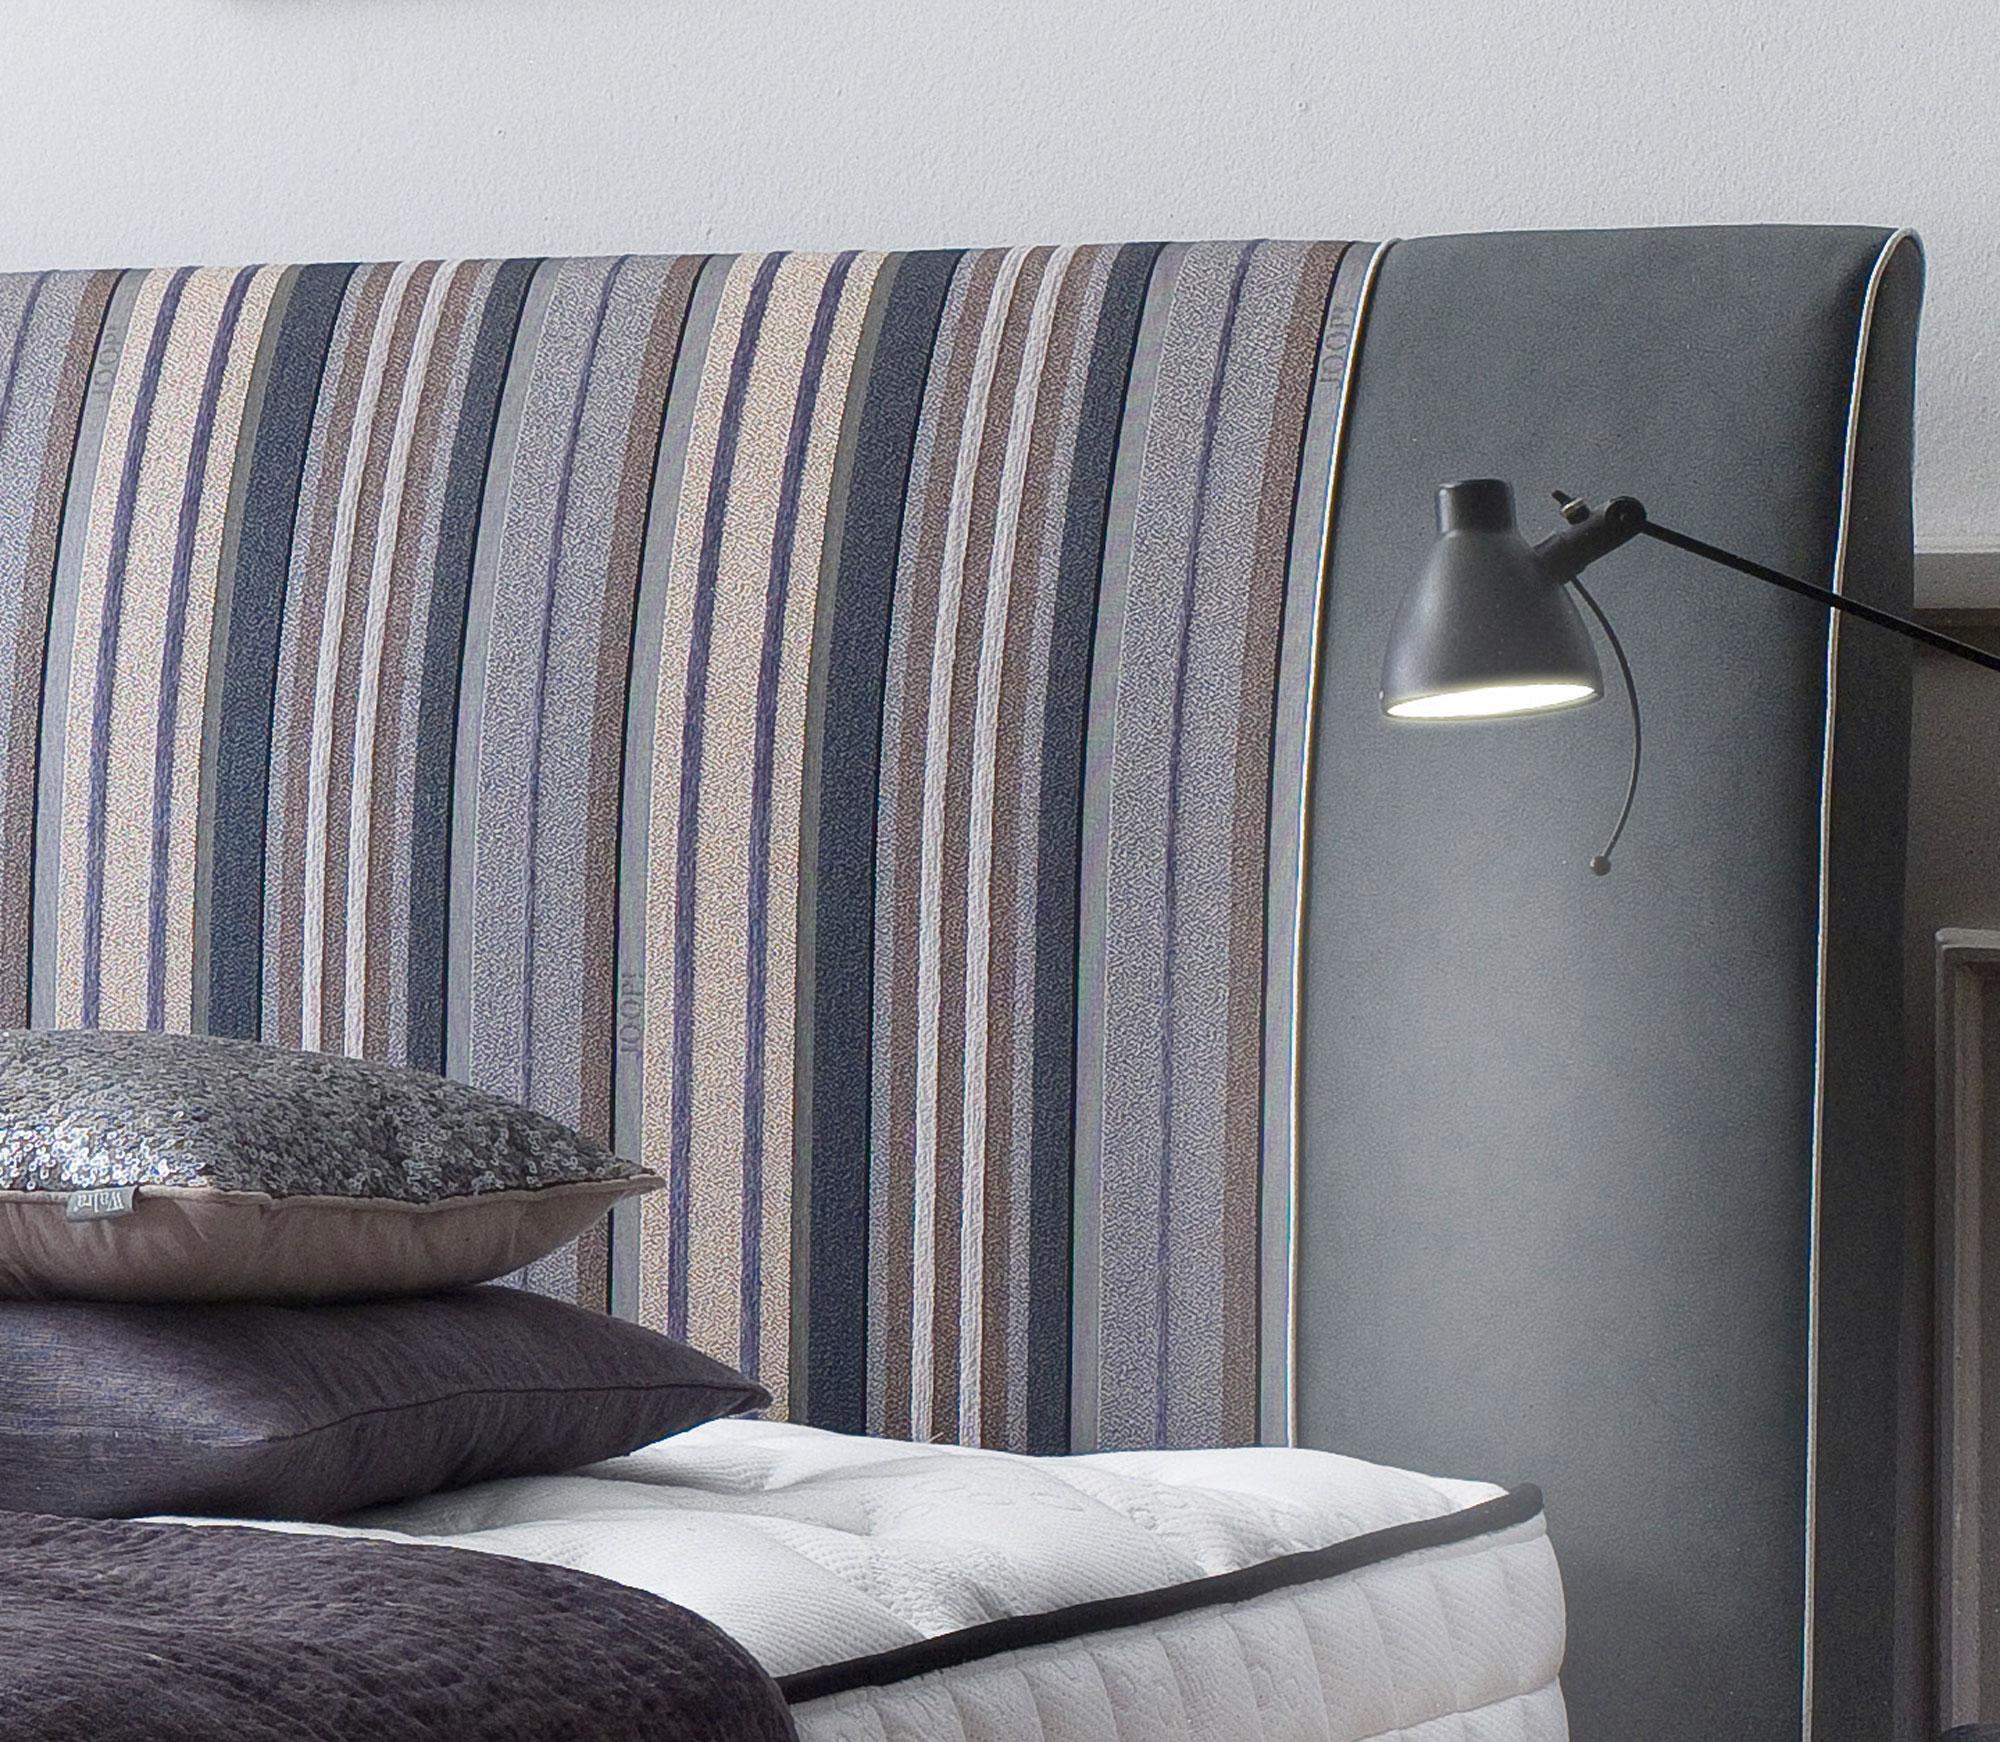 boxspringbett 39 39 alano 39 39 bett matratze dami wohn. Black Bedroom Furniture Sets. Home Design Ideas